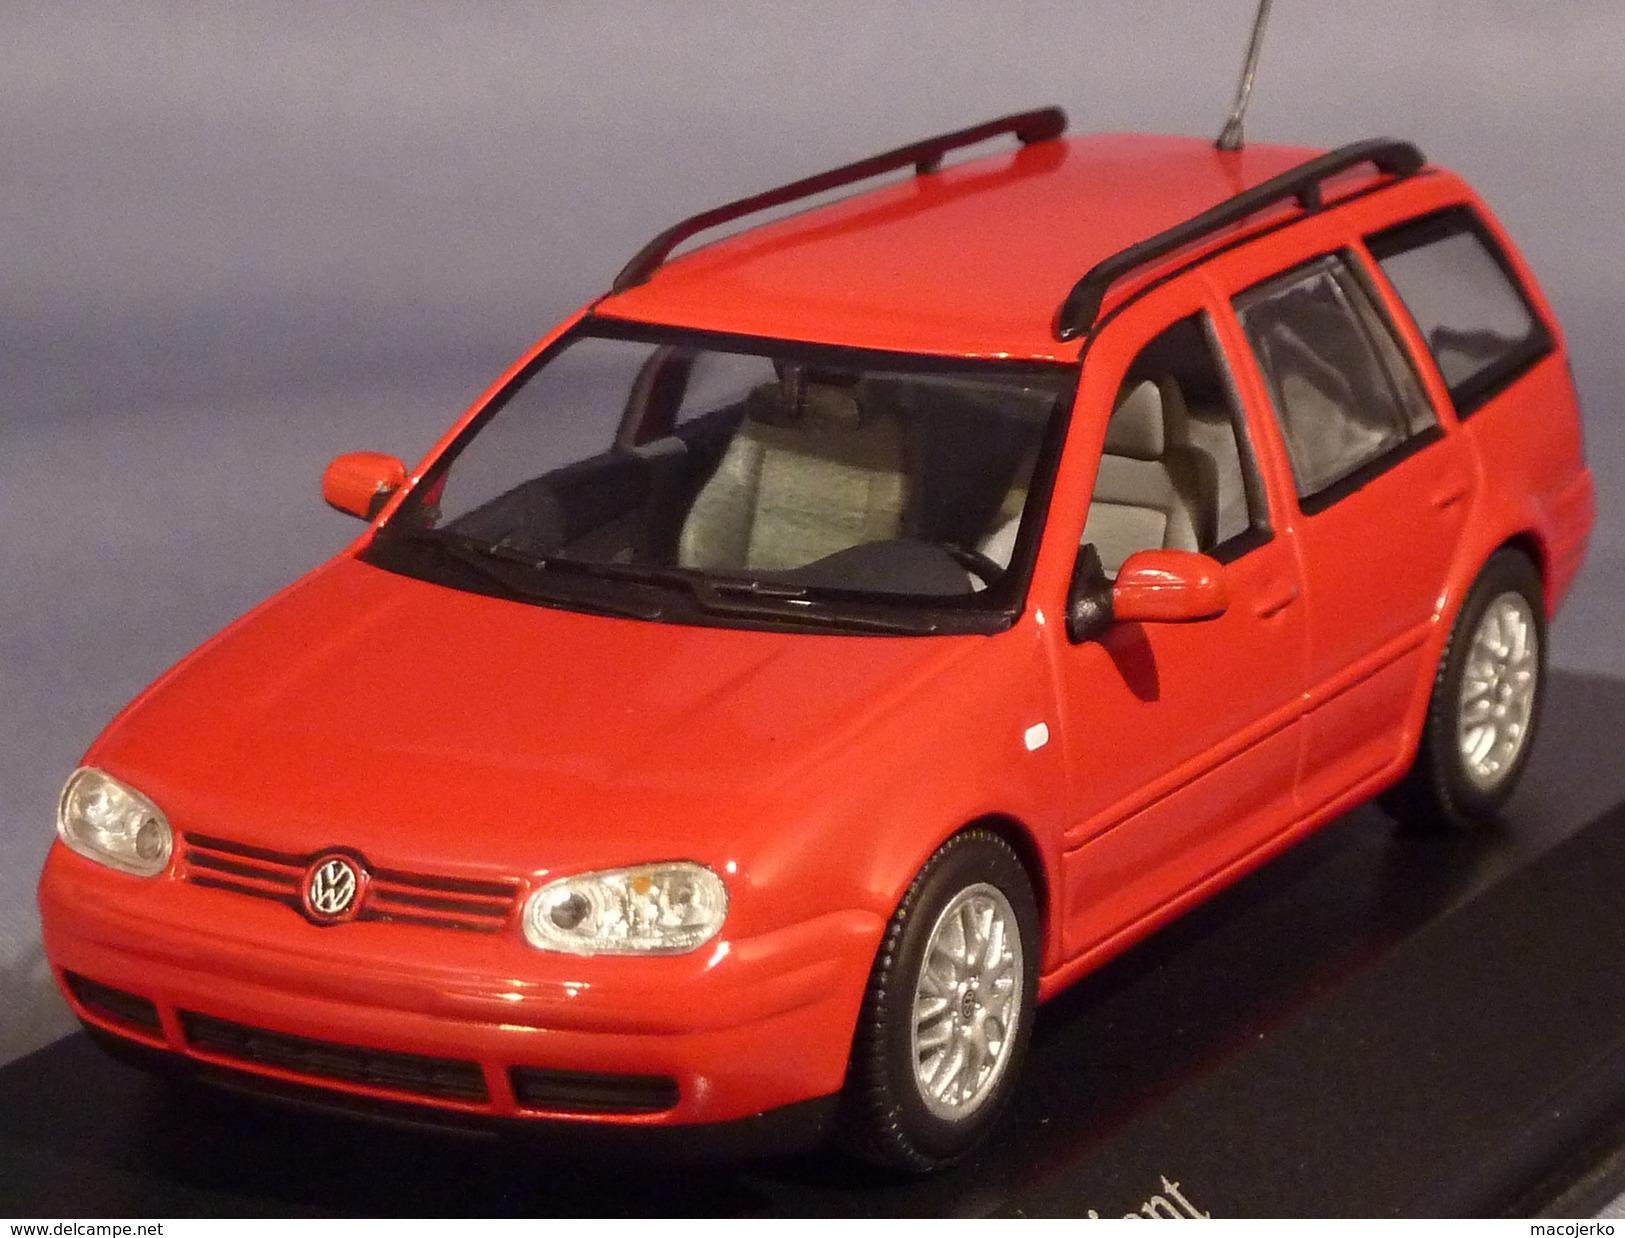 Minichamps 430056011, VW Golf IV Variant, 1997, 1:43 - Minichamps